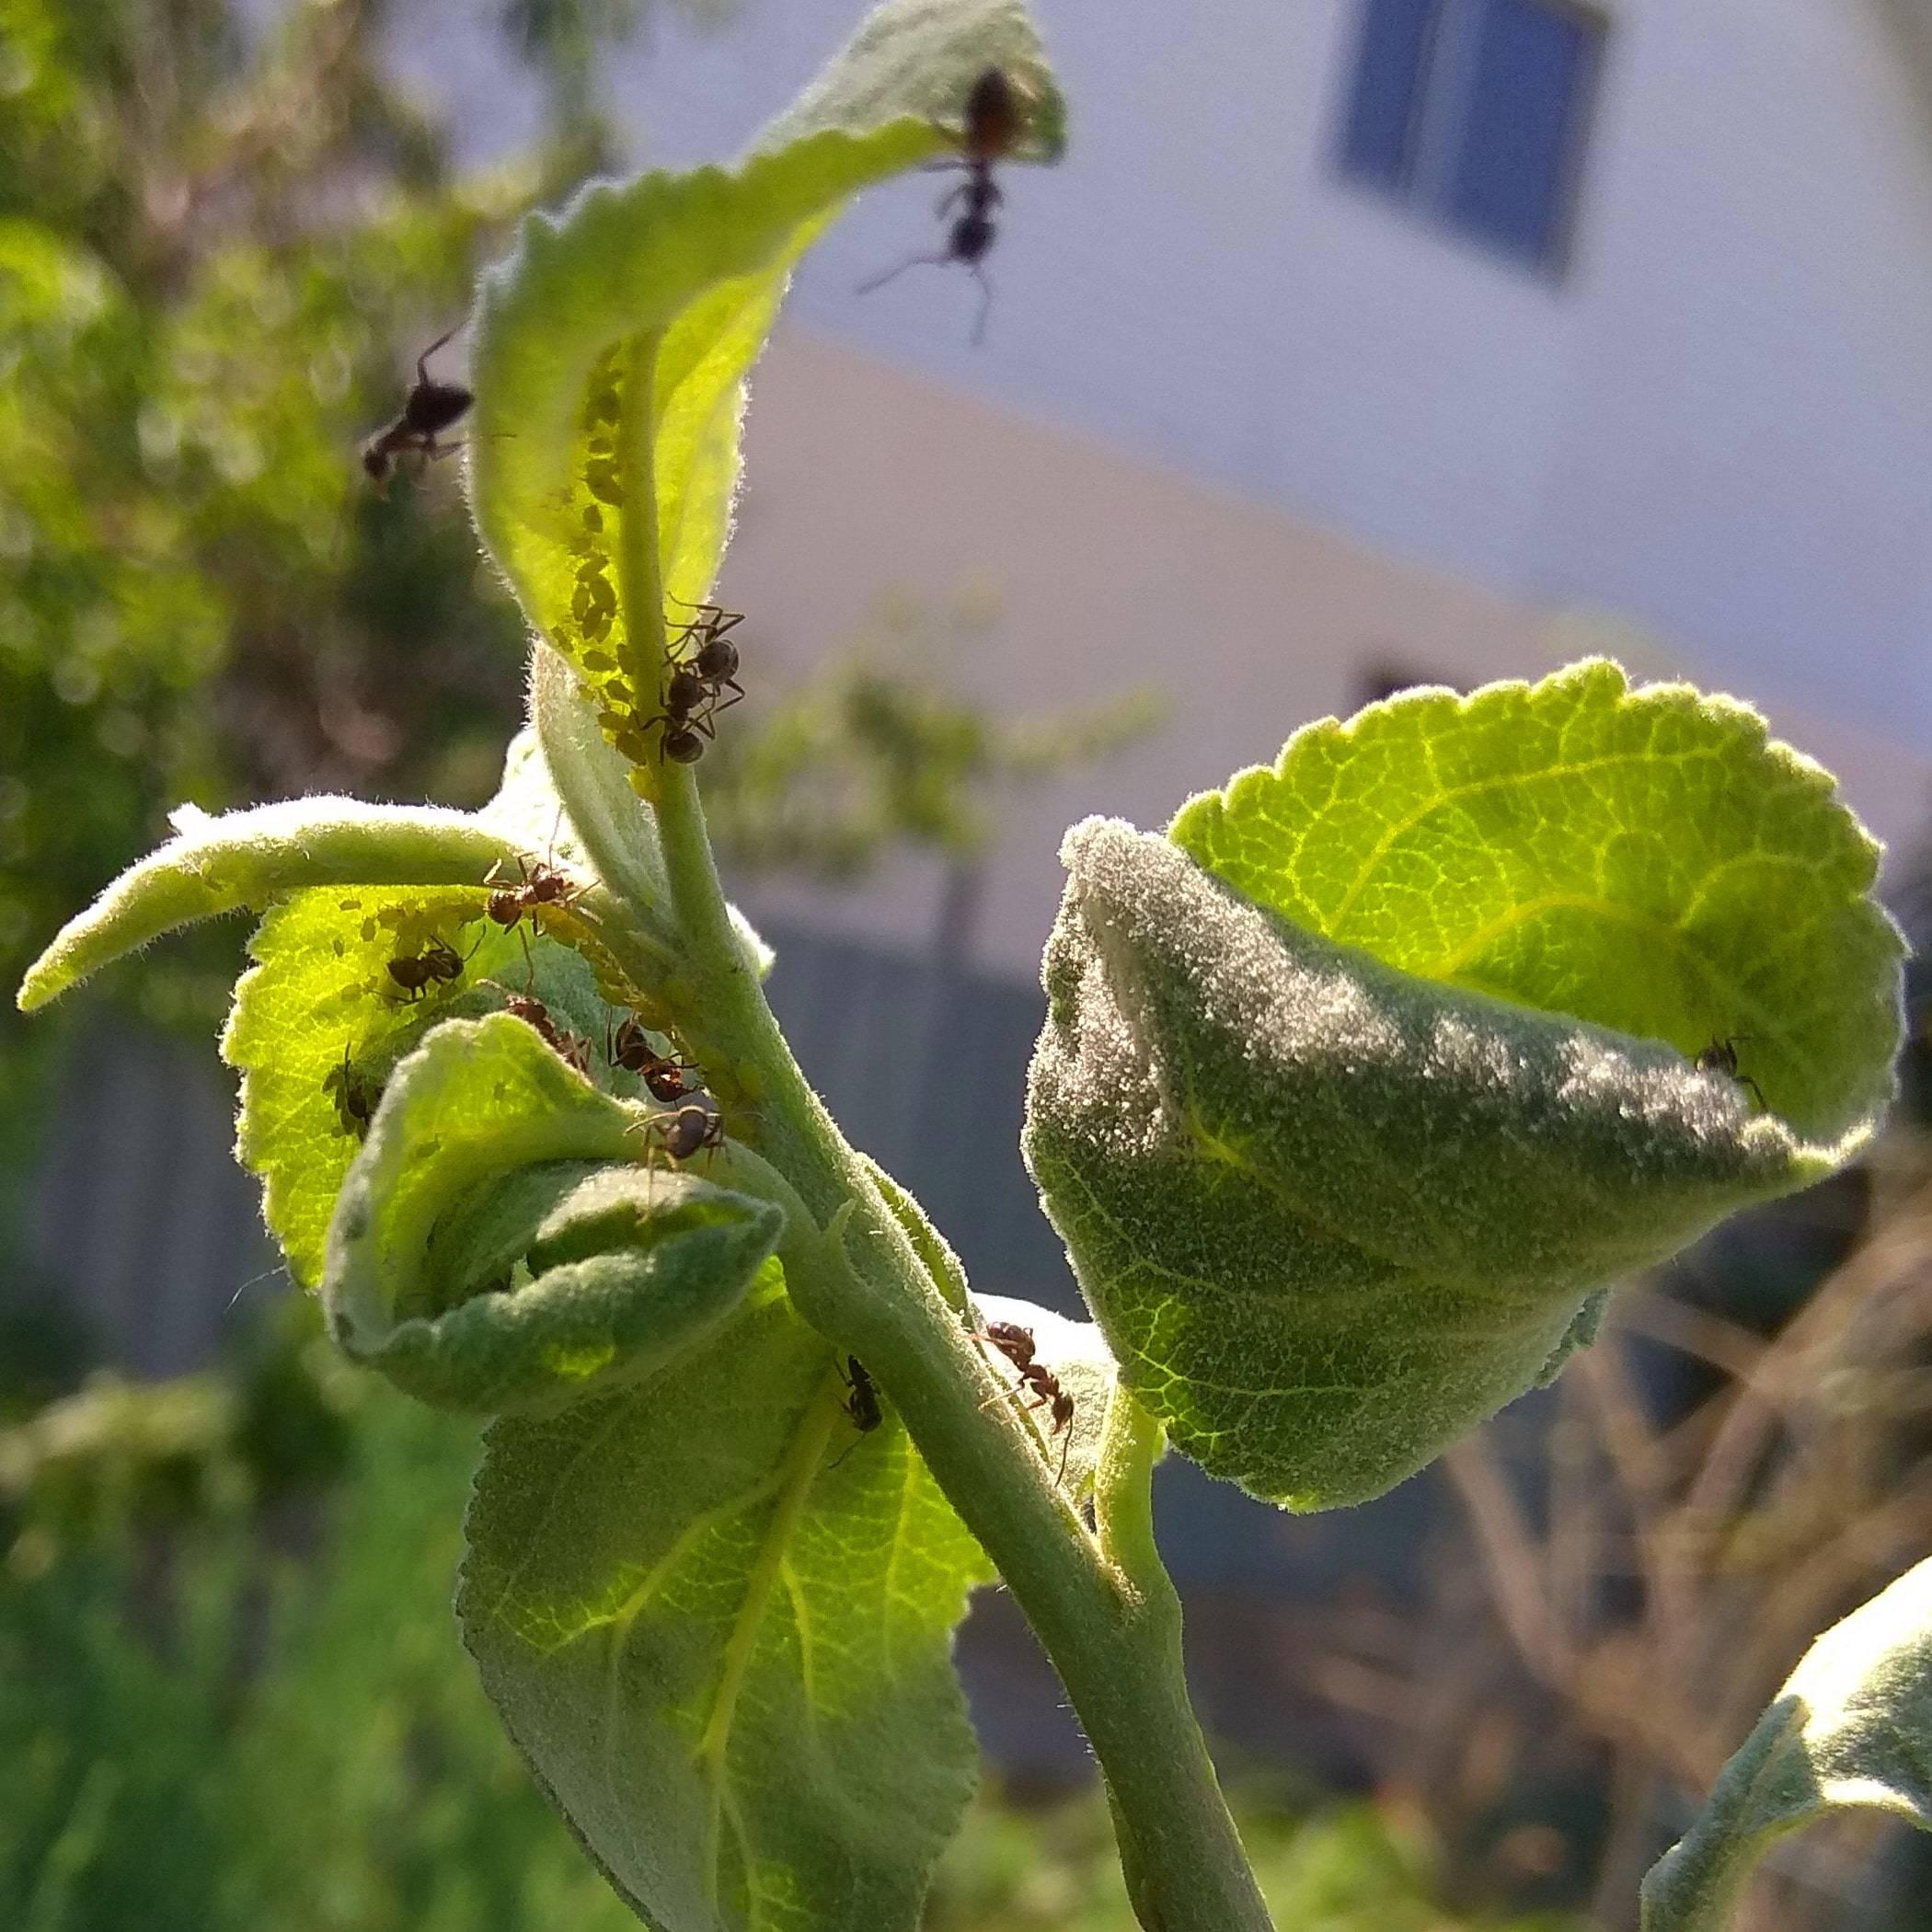 Тля на яблоне: как бороться, признаки, виды тли